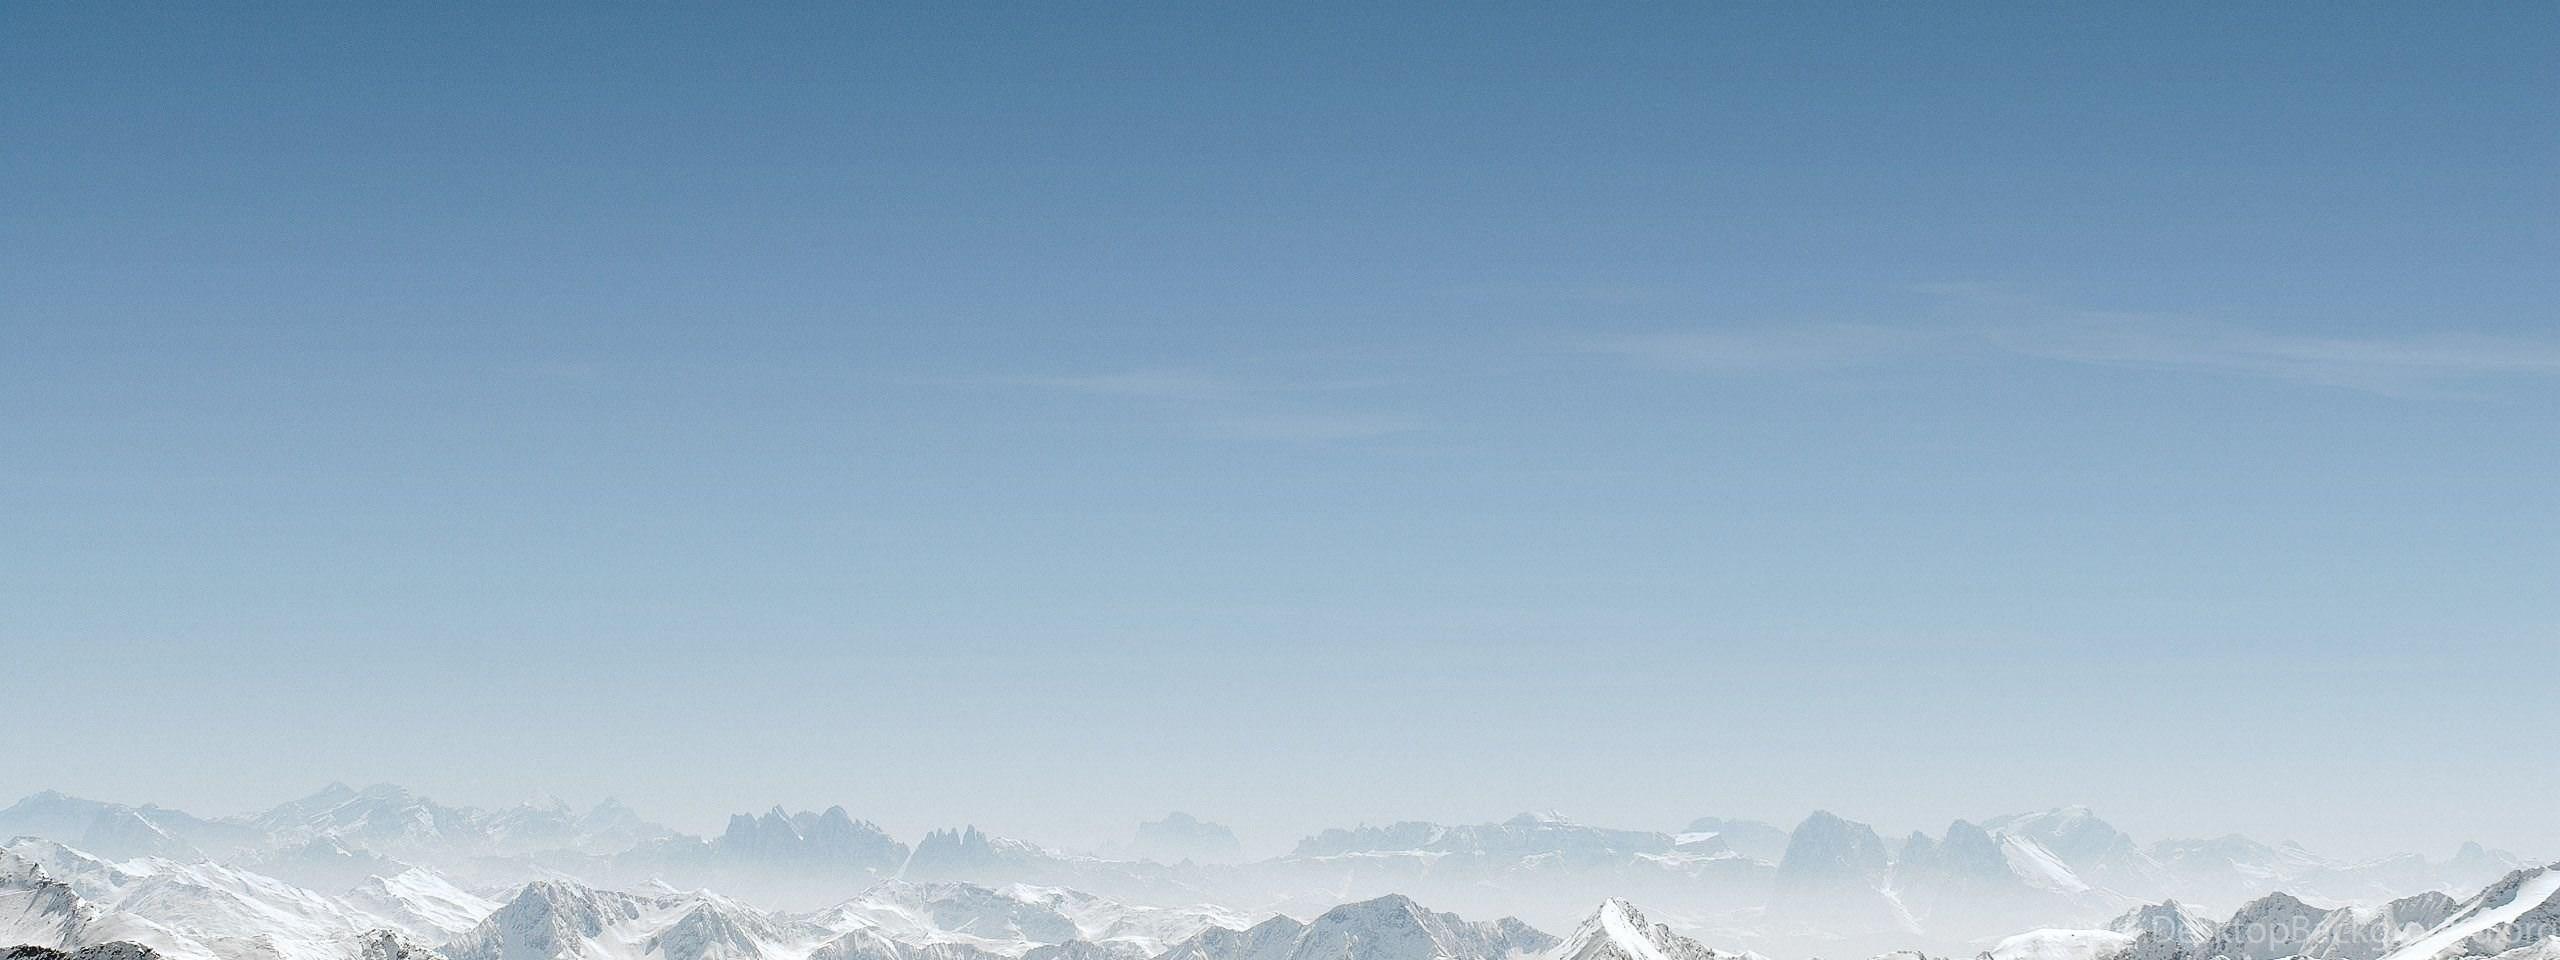 Must see Wallpaper Mountain Simple - 448233_wallpapers-mountains-simple-sky-blue-sky-snow-desktop-wallpapers_2560x1600_h  Snapshot_3039.jpg